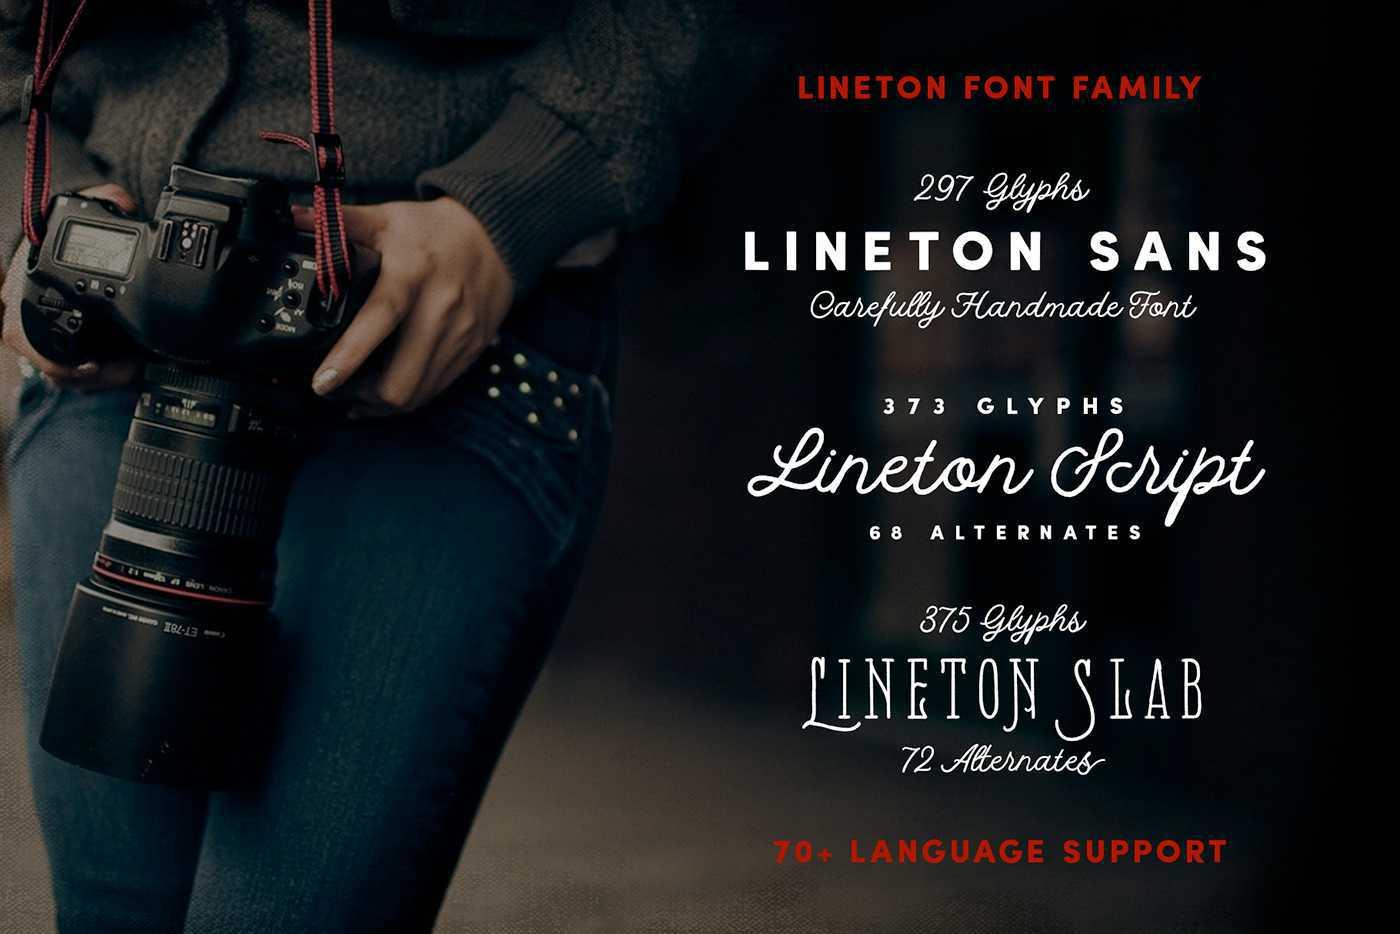 lineton-font-family-1